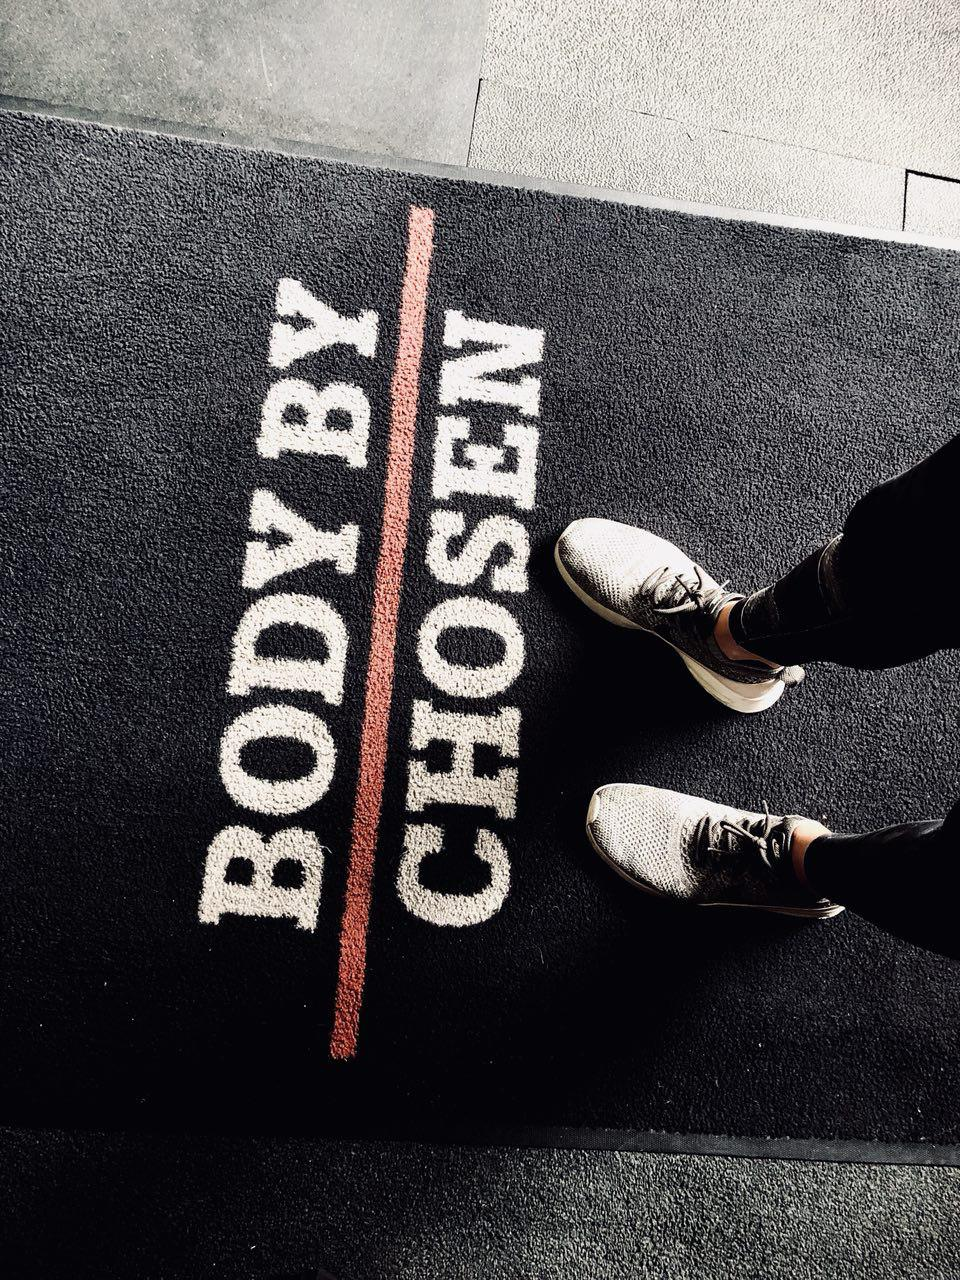 Body-by-chosen-entrance.jpg